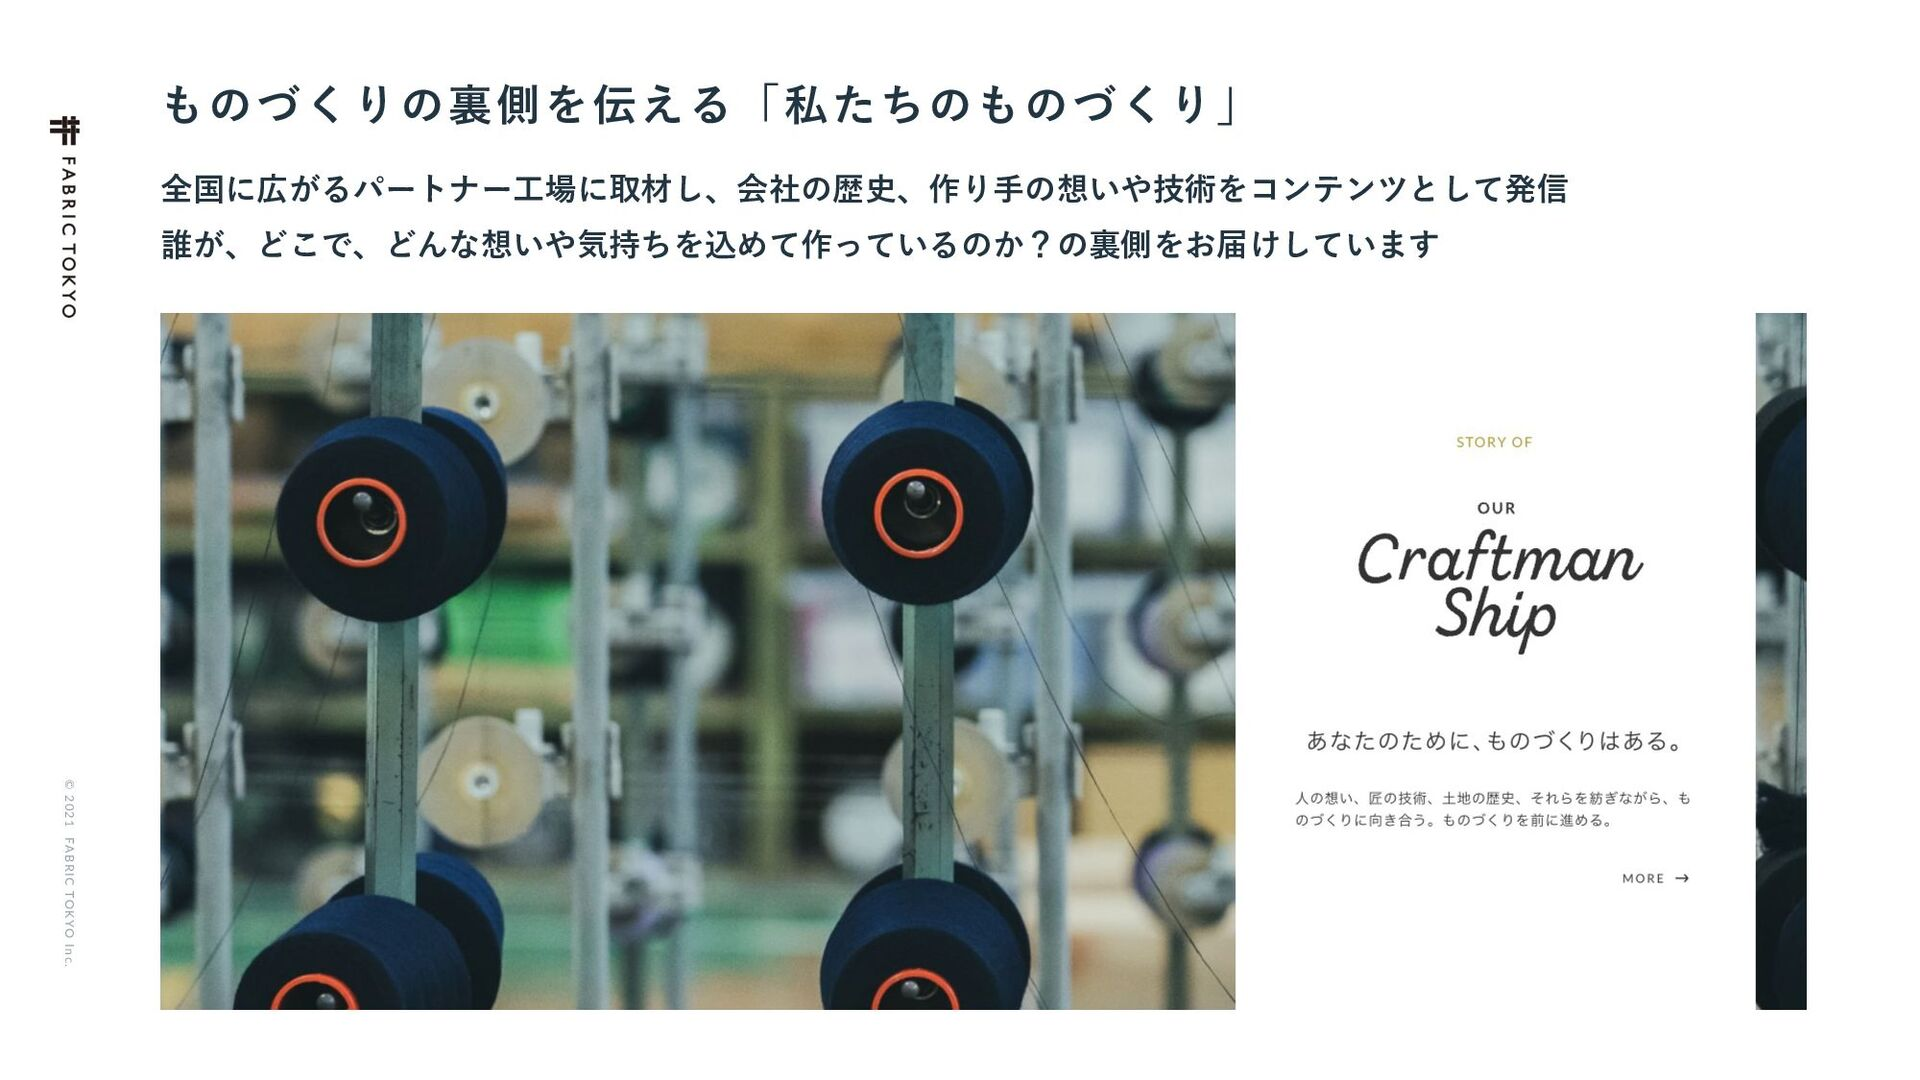 © 2021 FABRIC TOKYO Inc. 28 ͨΒ͘ڥʹ͍ͭͯ ˔ ΦϑΟεۈ...